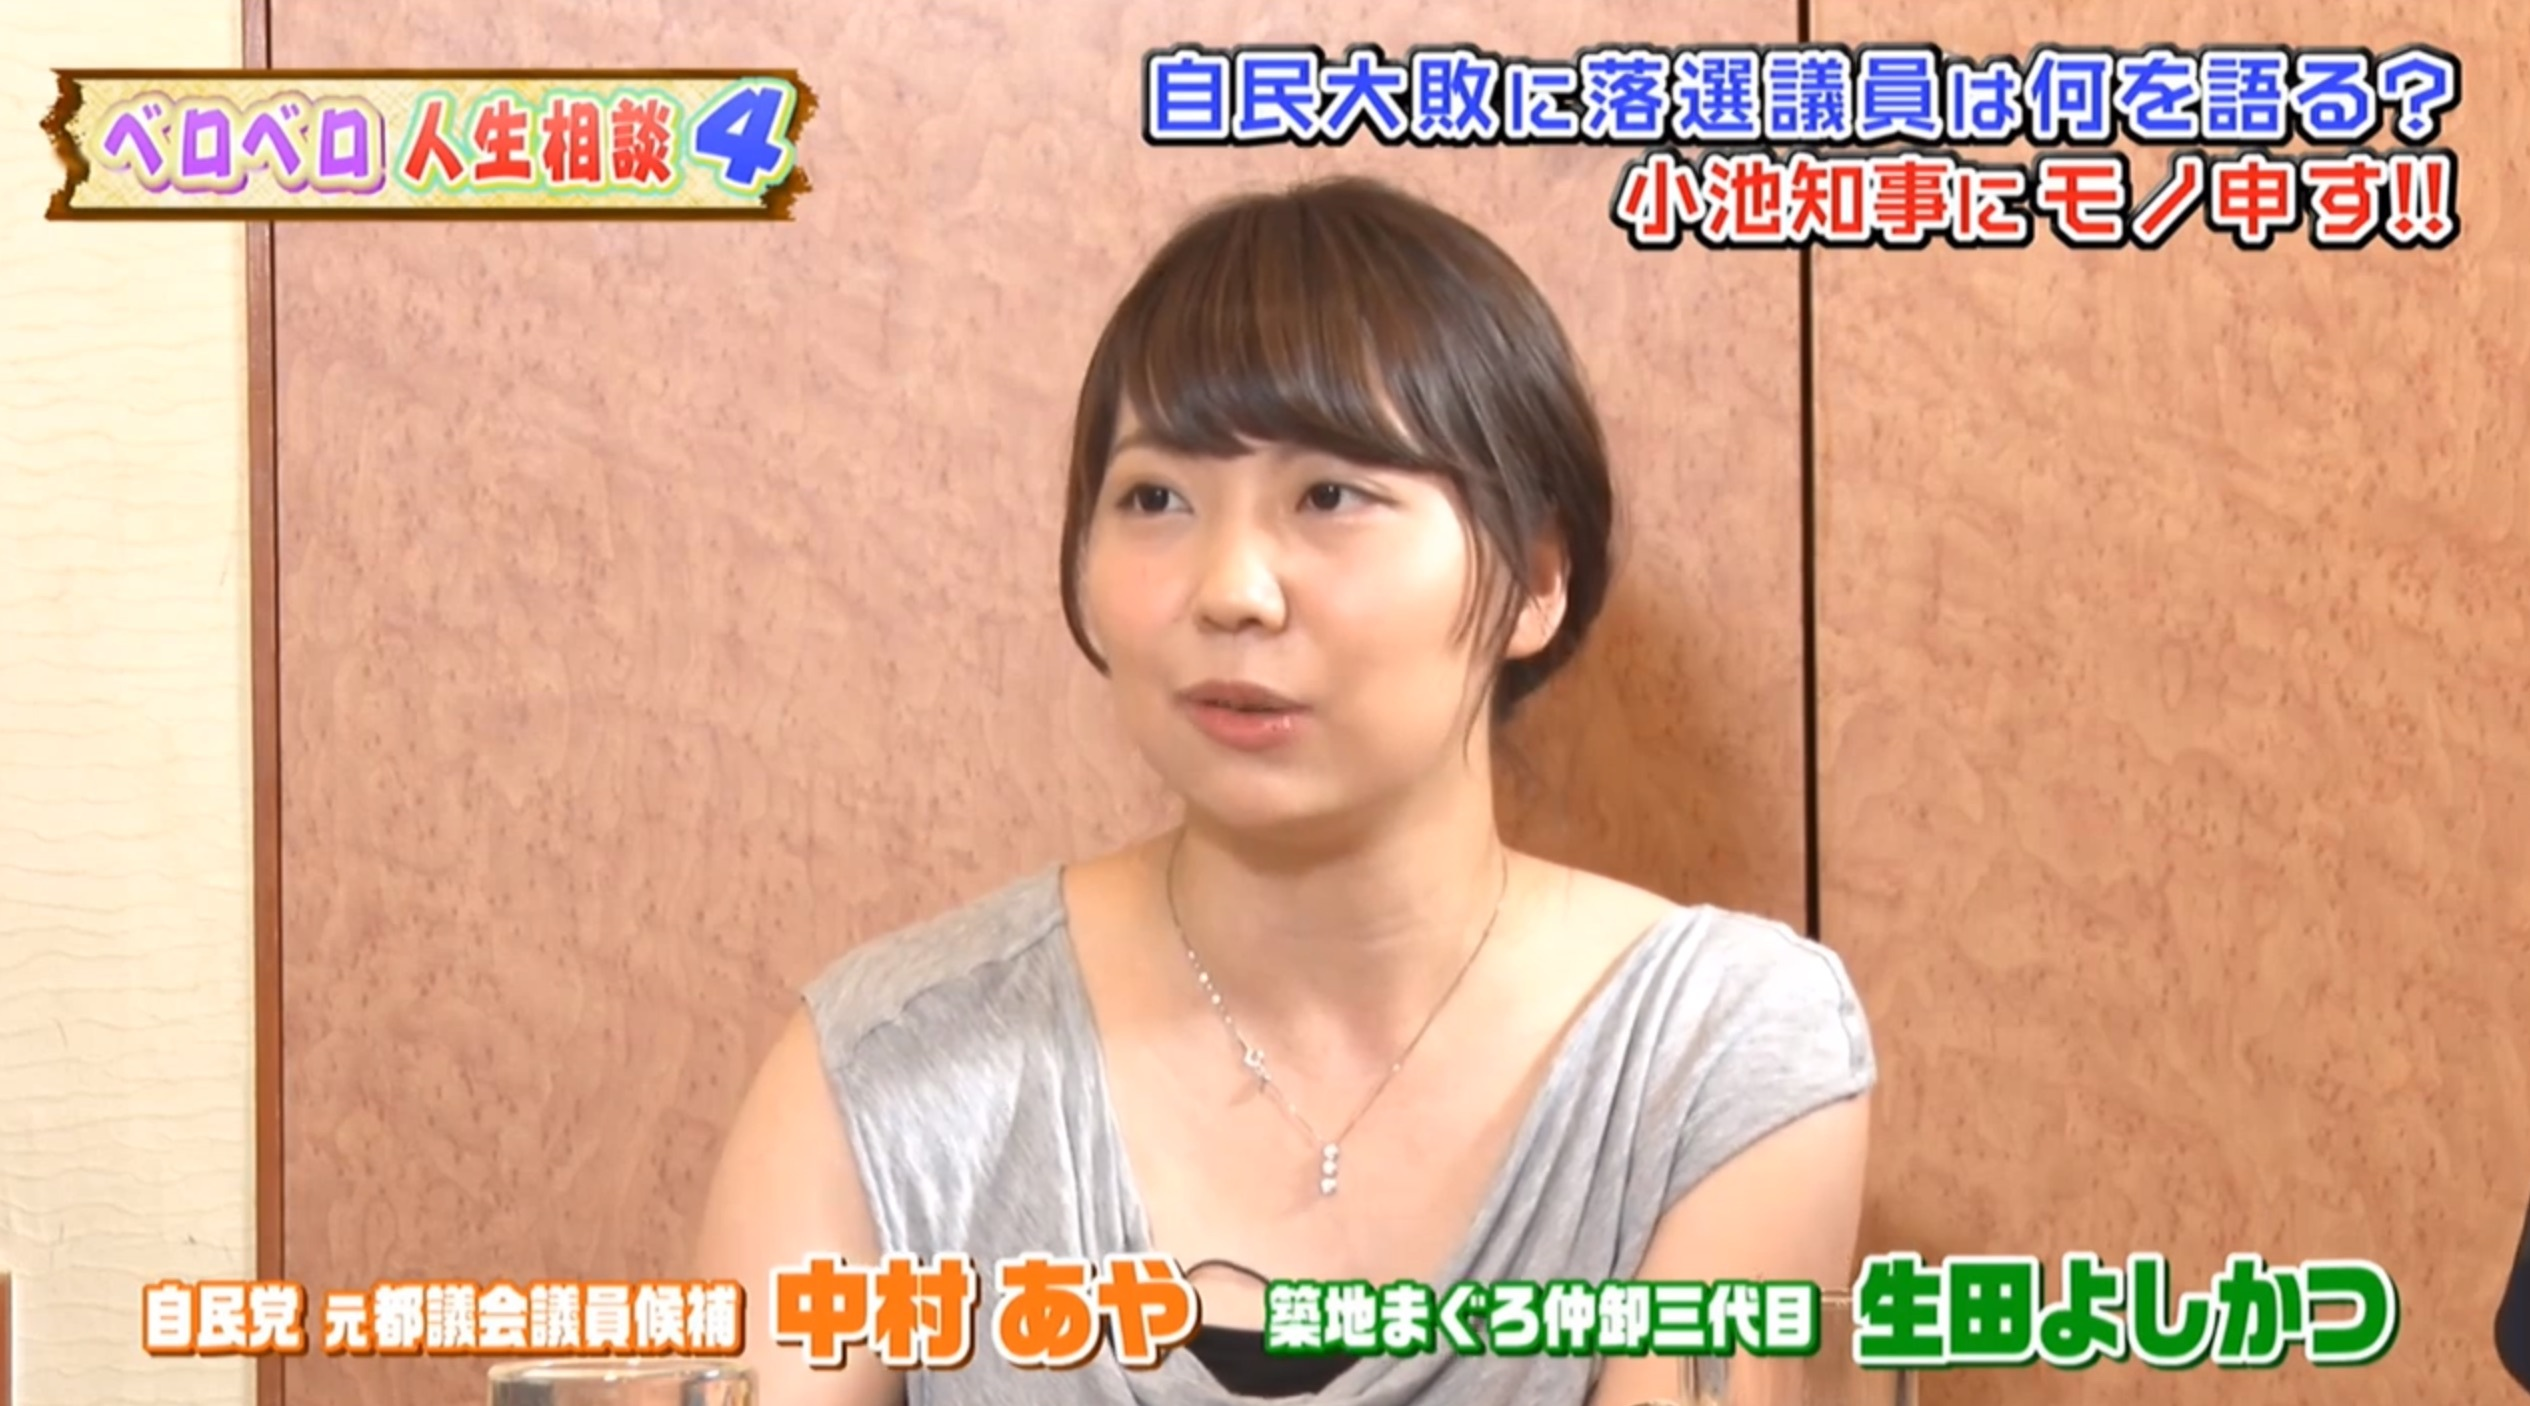 pimpandhost.com ala- melissa Yükle (380x567) · 女 装 百 合 子 pimpandhost.com ala- melissa.